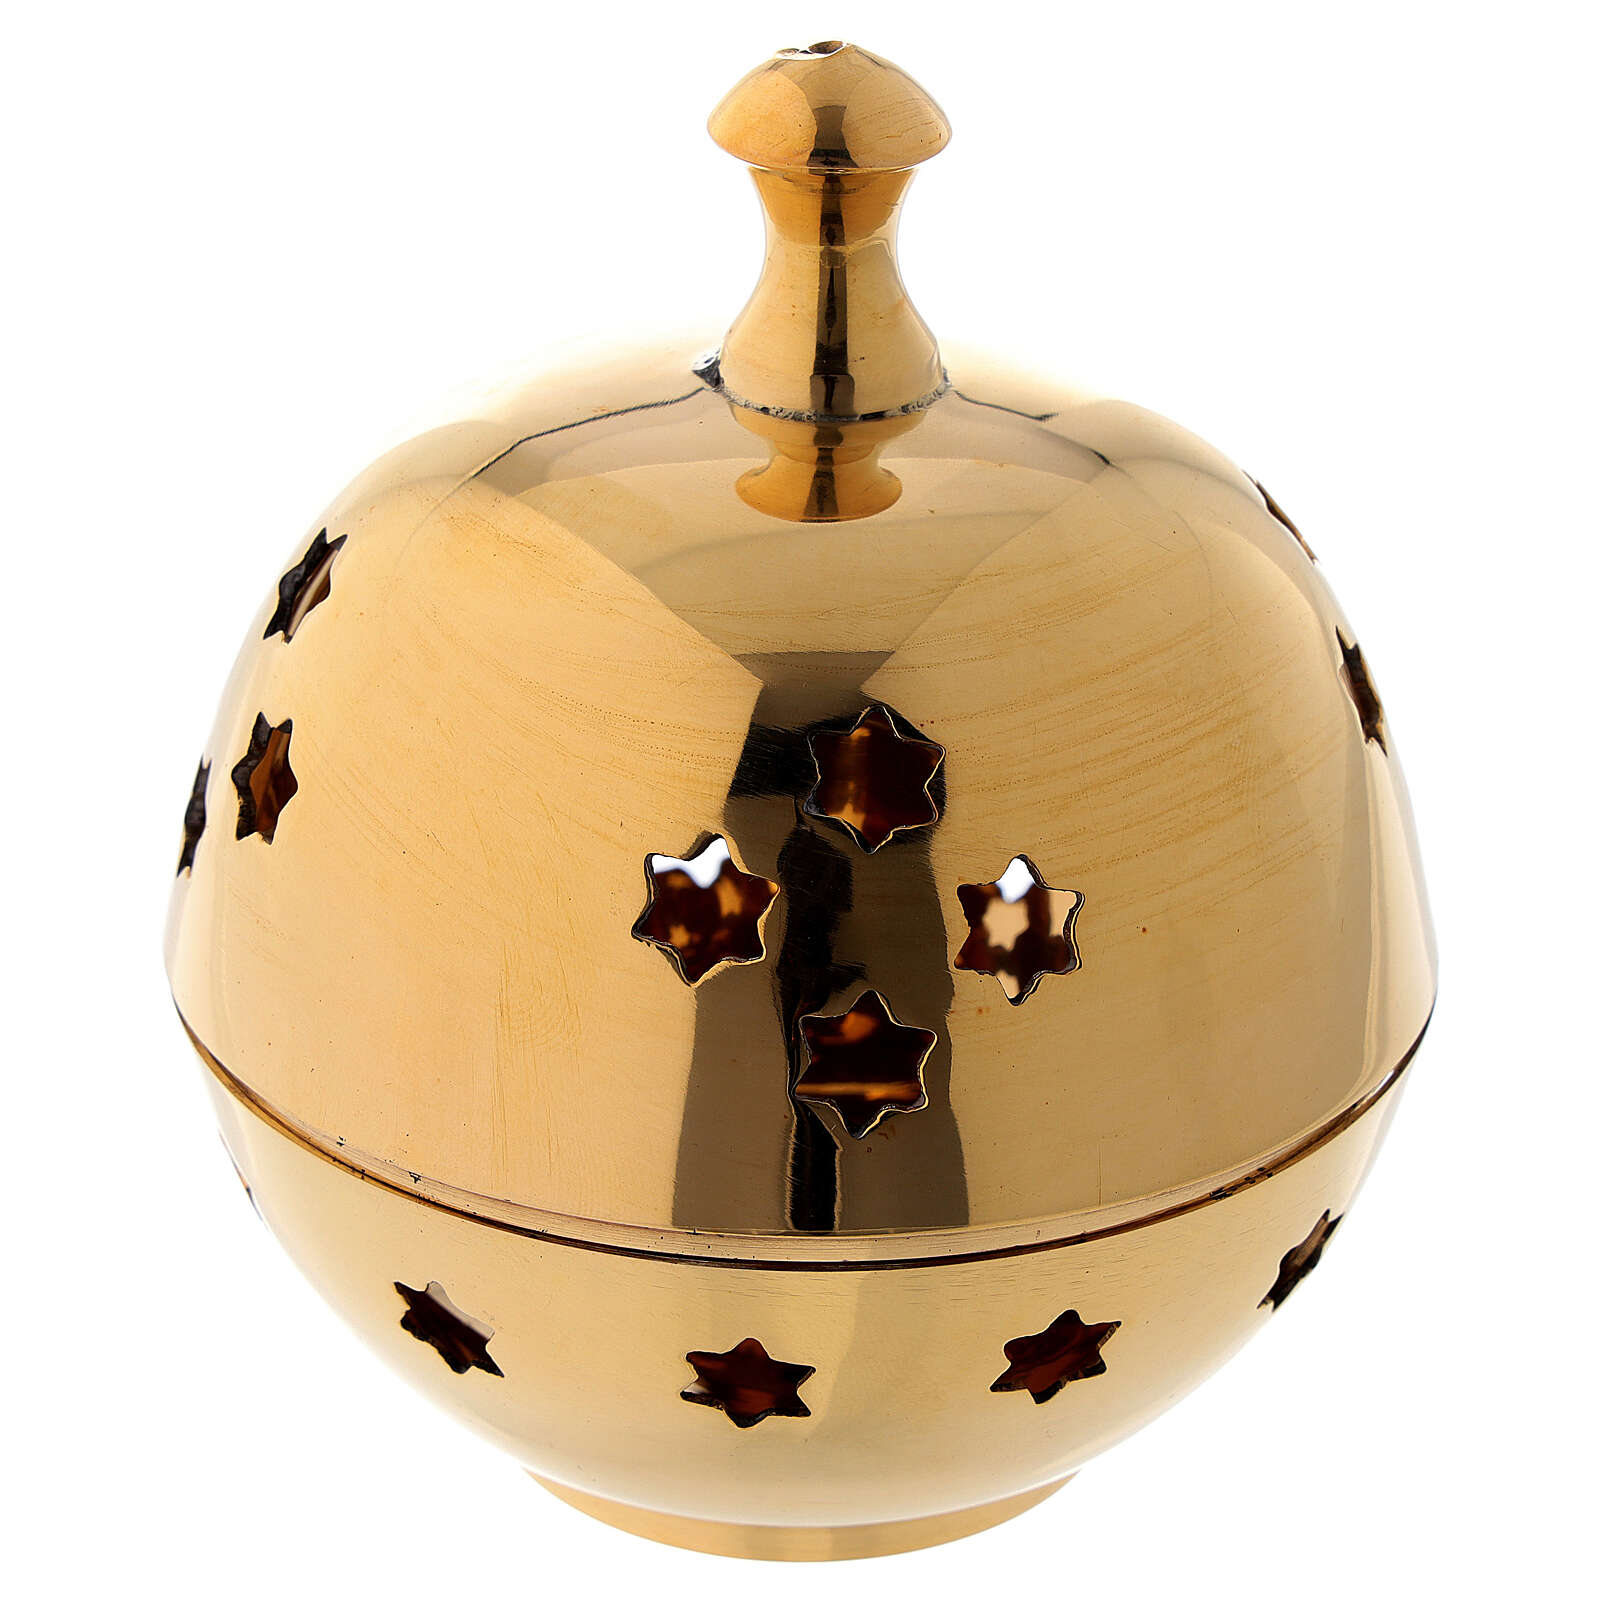 Pebetero copa redonda agujeros estrellas diámetro 8 cm 3